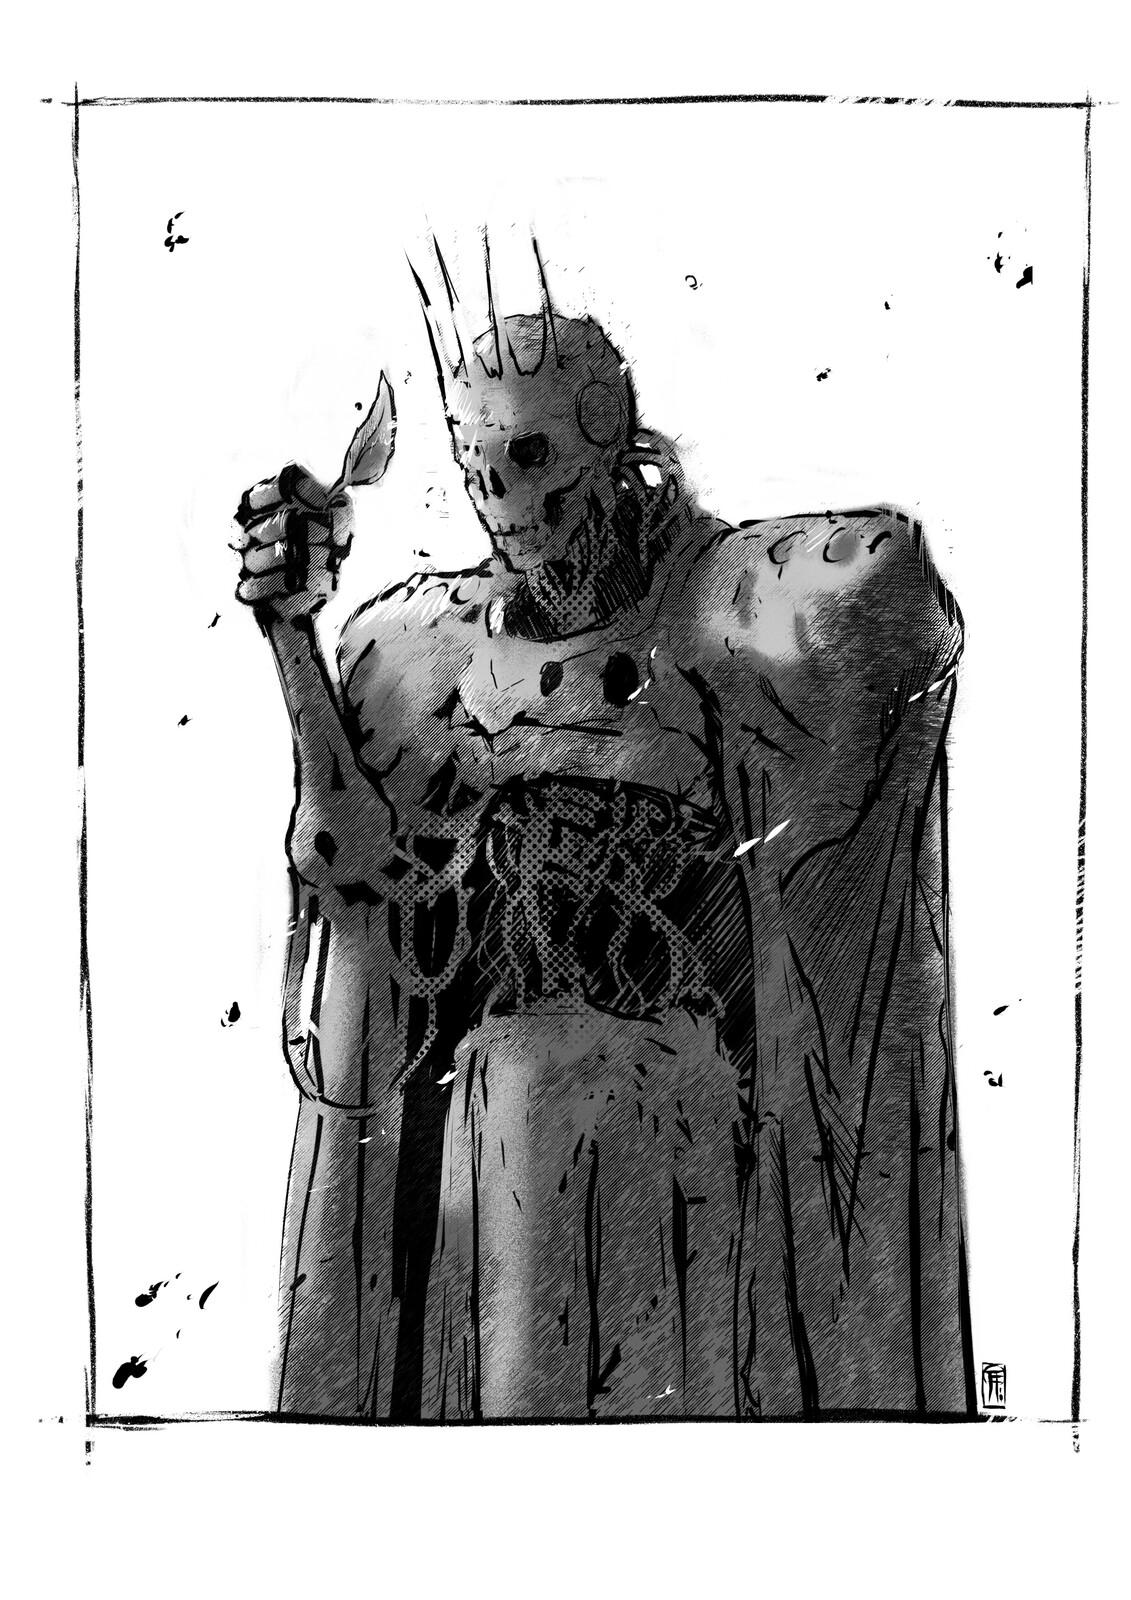 Prince Le Skull